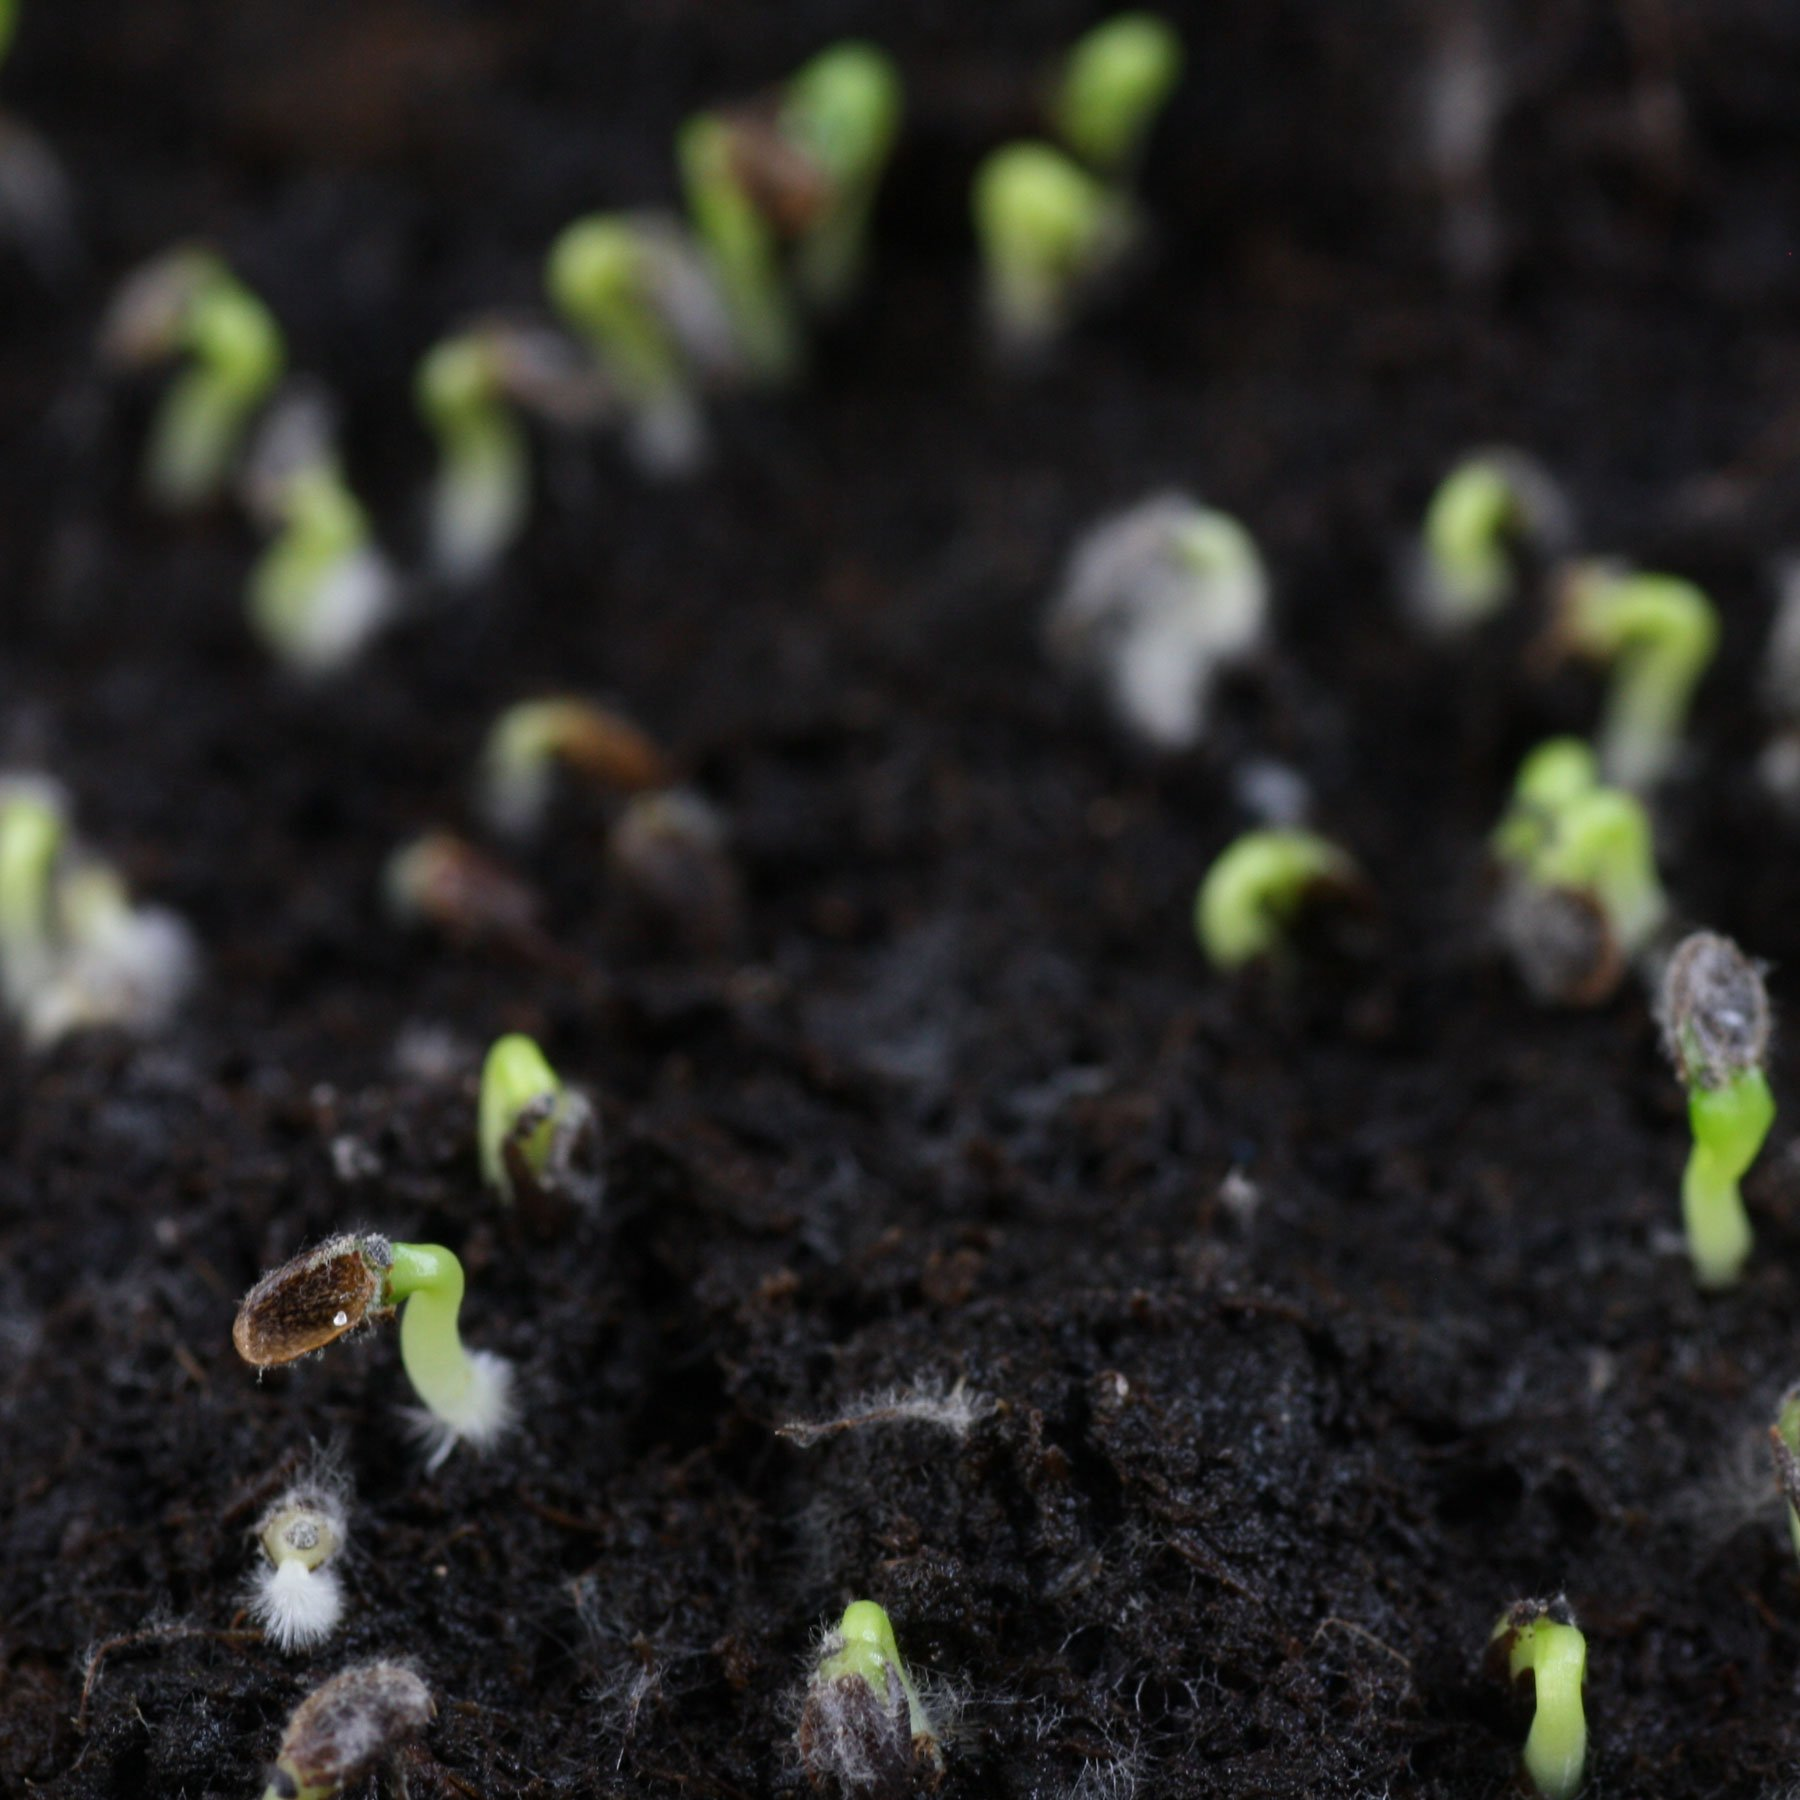 Platycodon germination